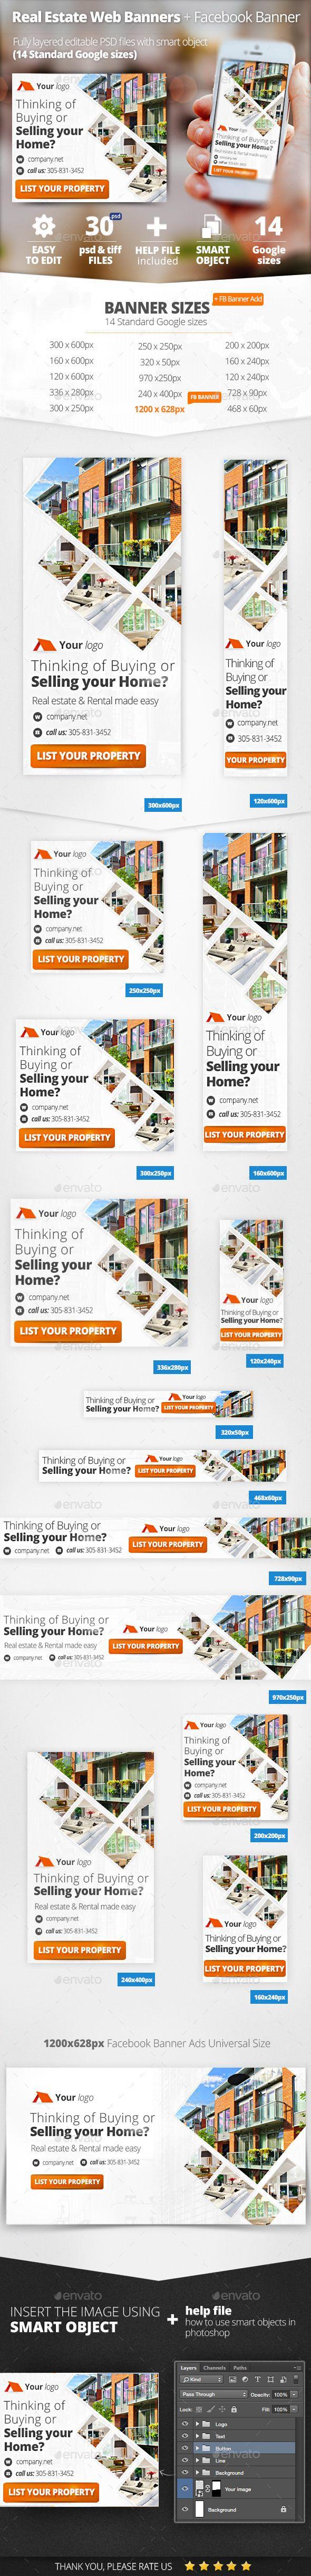 best 10 facebook banner ideas on pinterest type web web banner